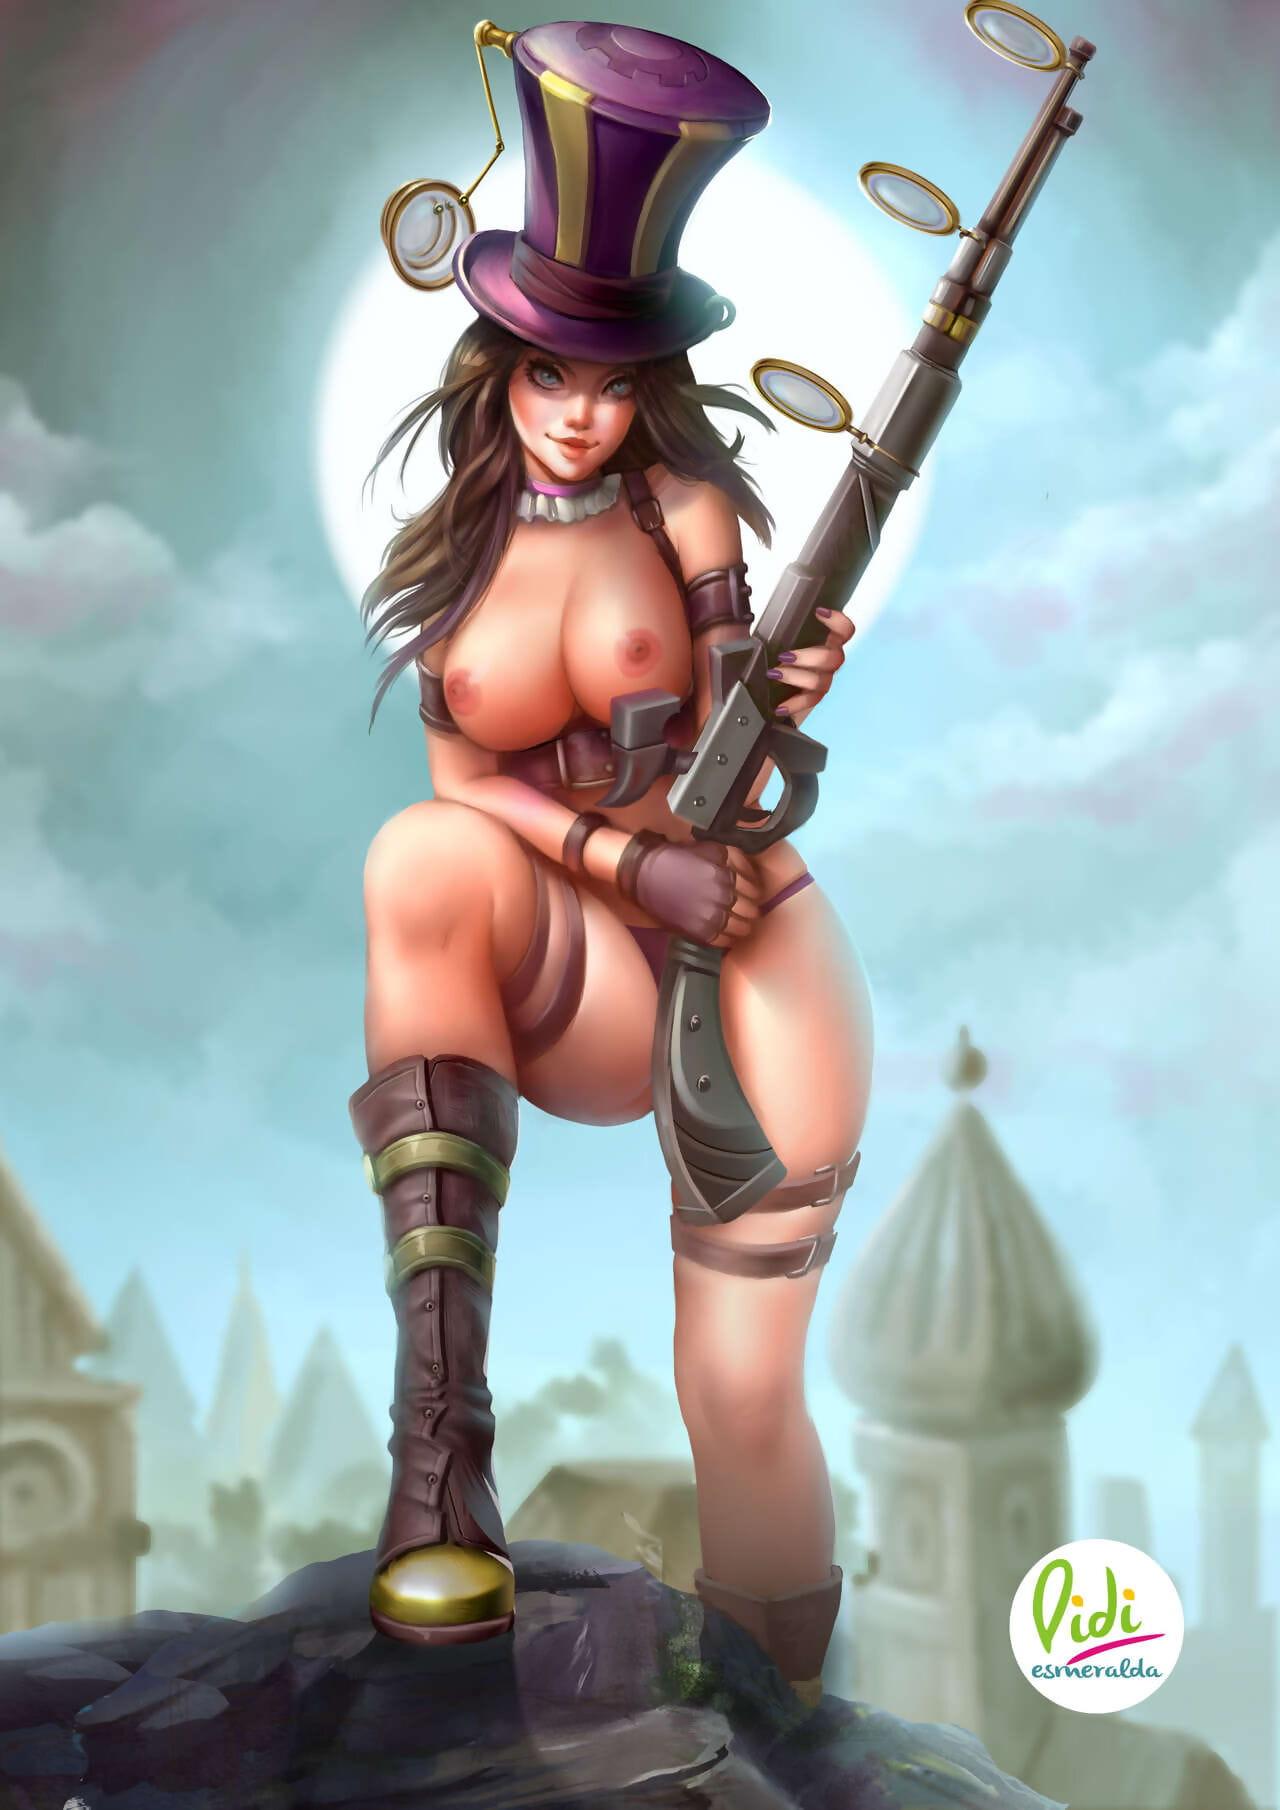 Intriguer - Didi Esmeralda